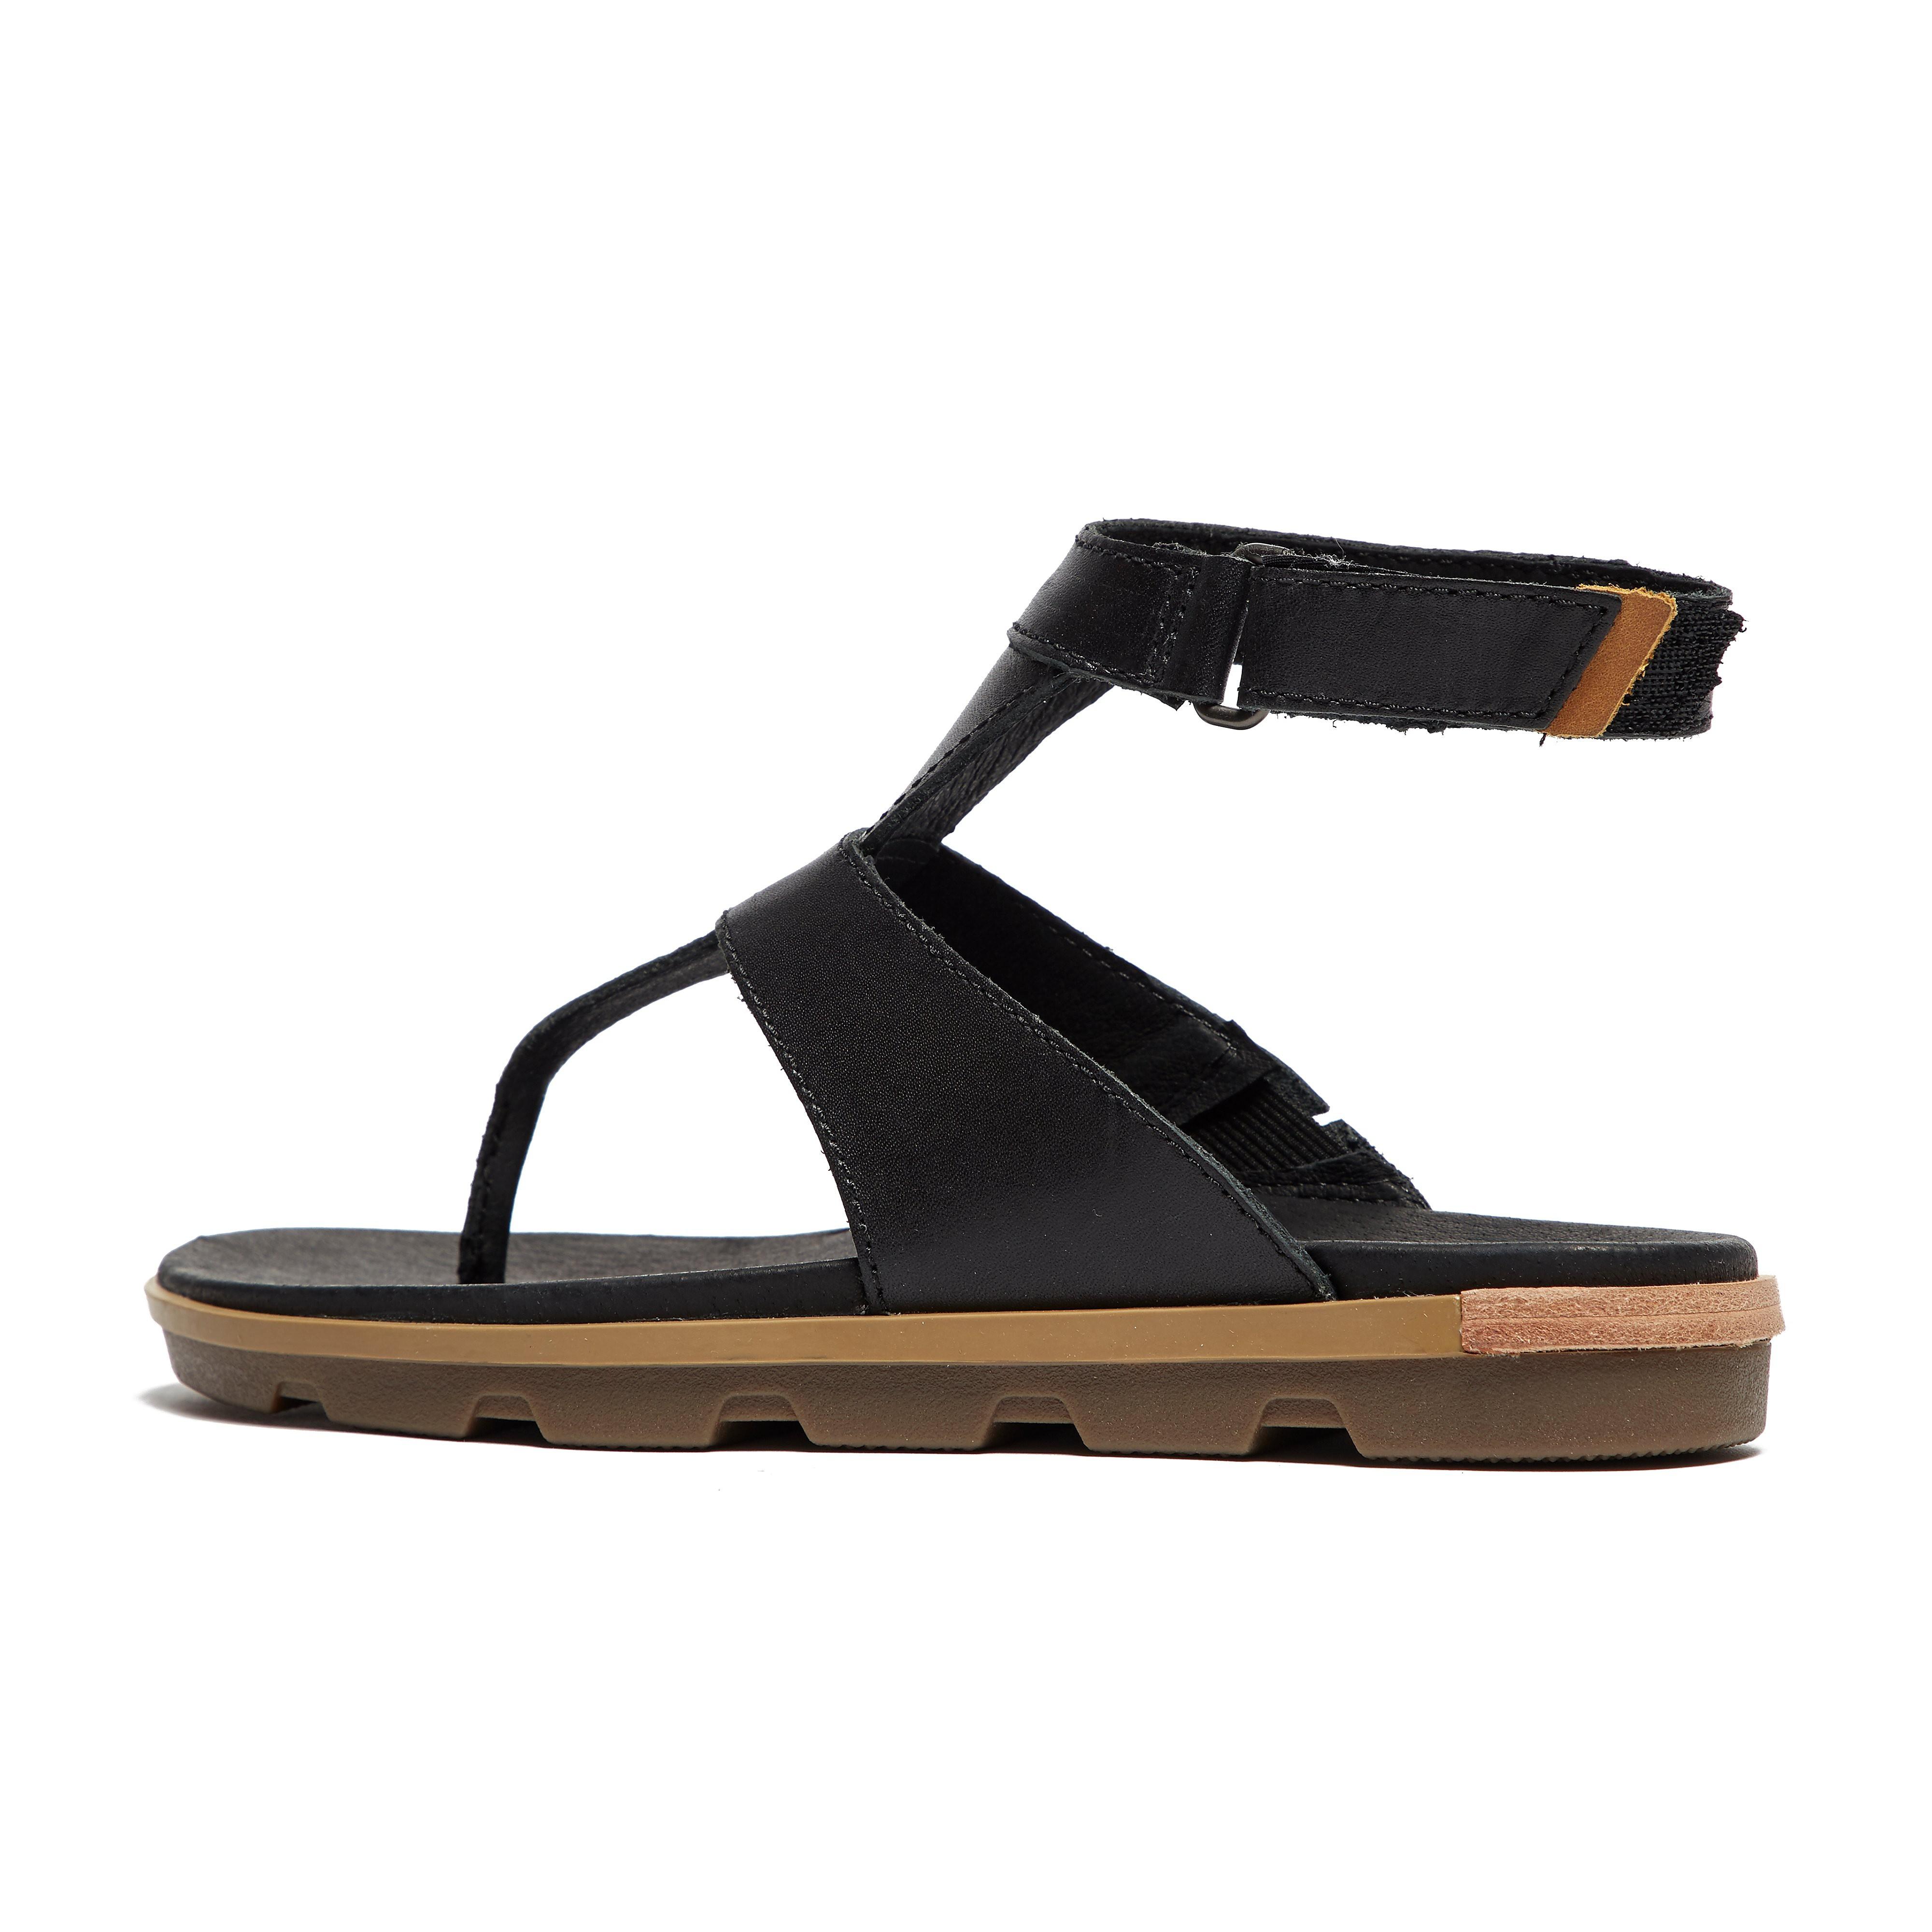 Sorel Torpeda Ankle Strap Women's Walking Sandals